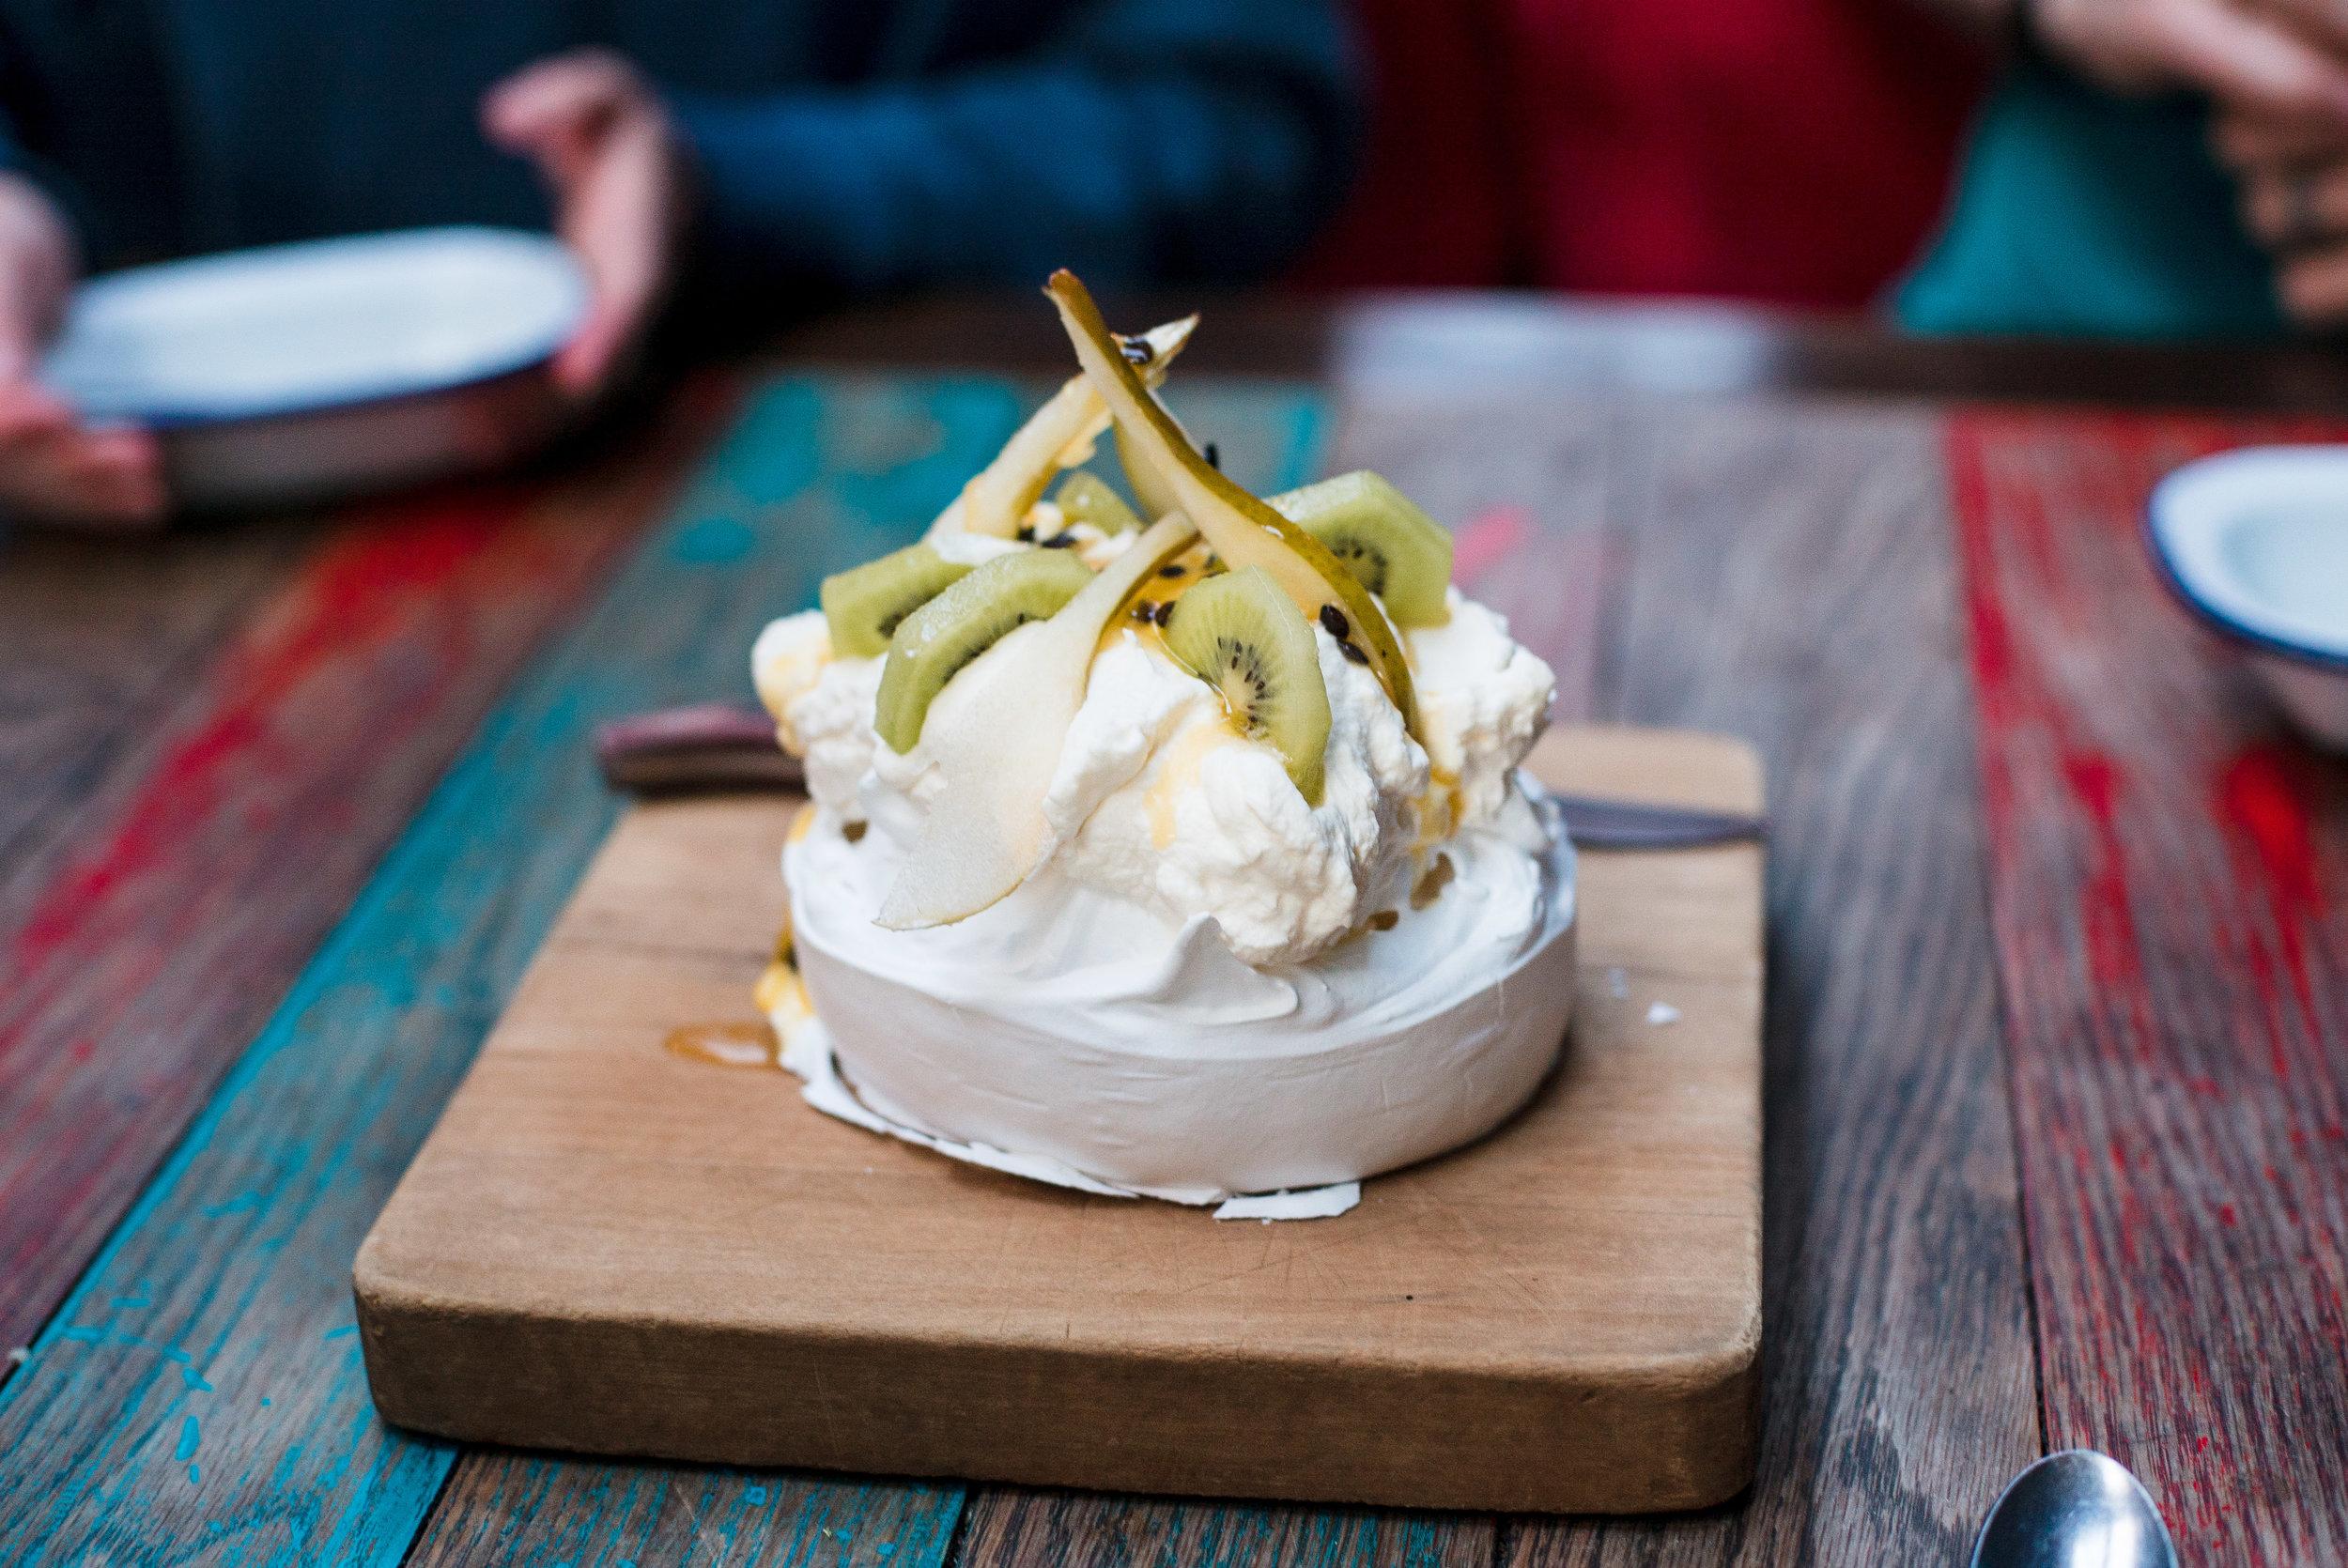 A Pavlova from Public Kitchen & Bar, a New Zealand dessert specialty